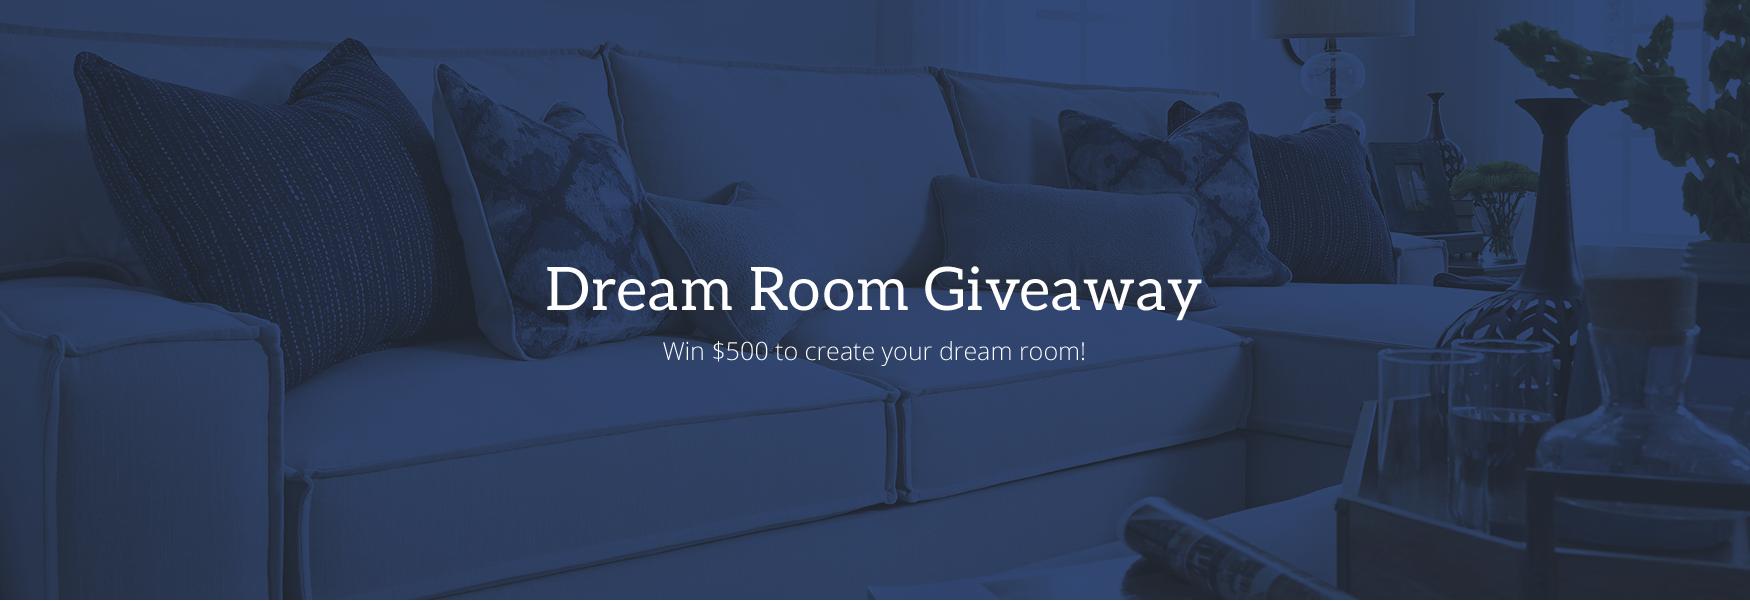 Dream Room Giveaway